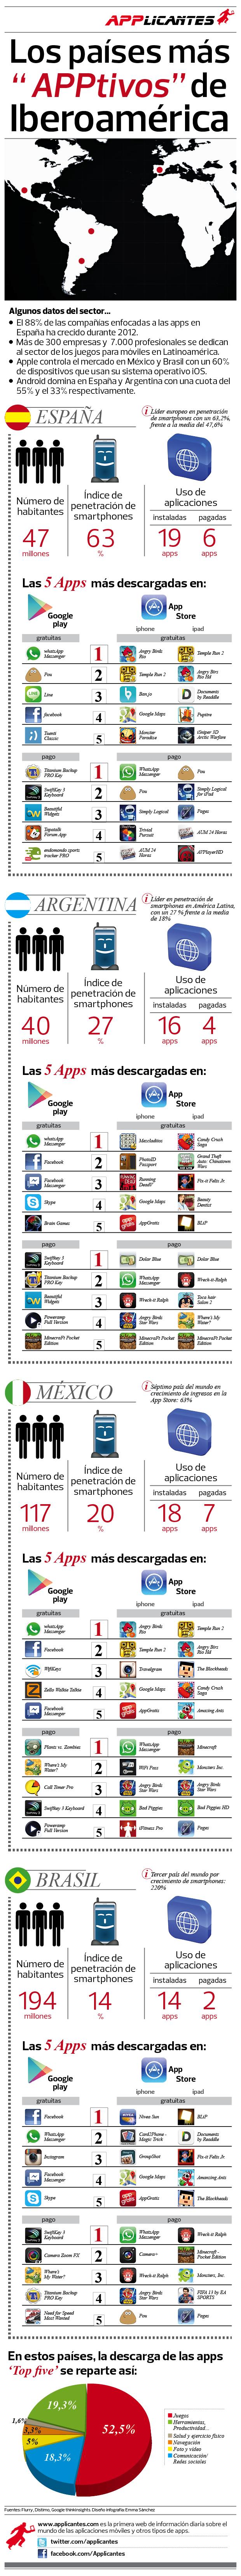 Las APPS en Iberoamérica